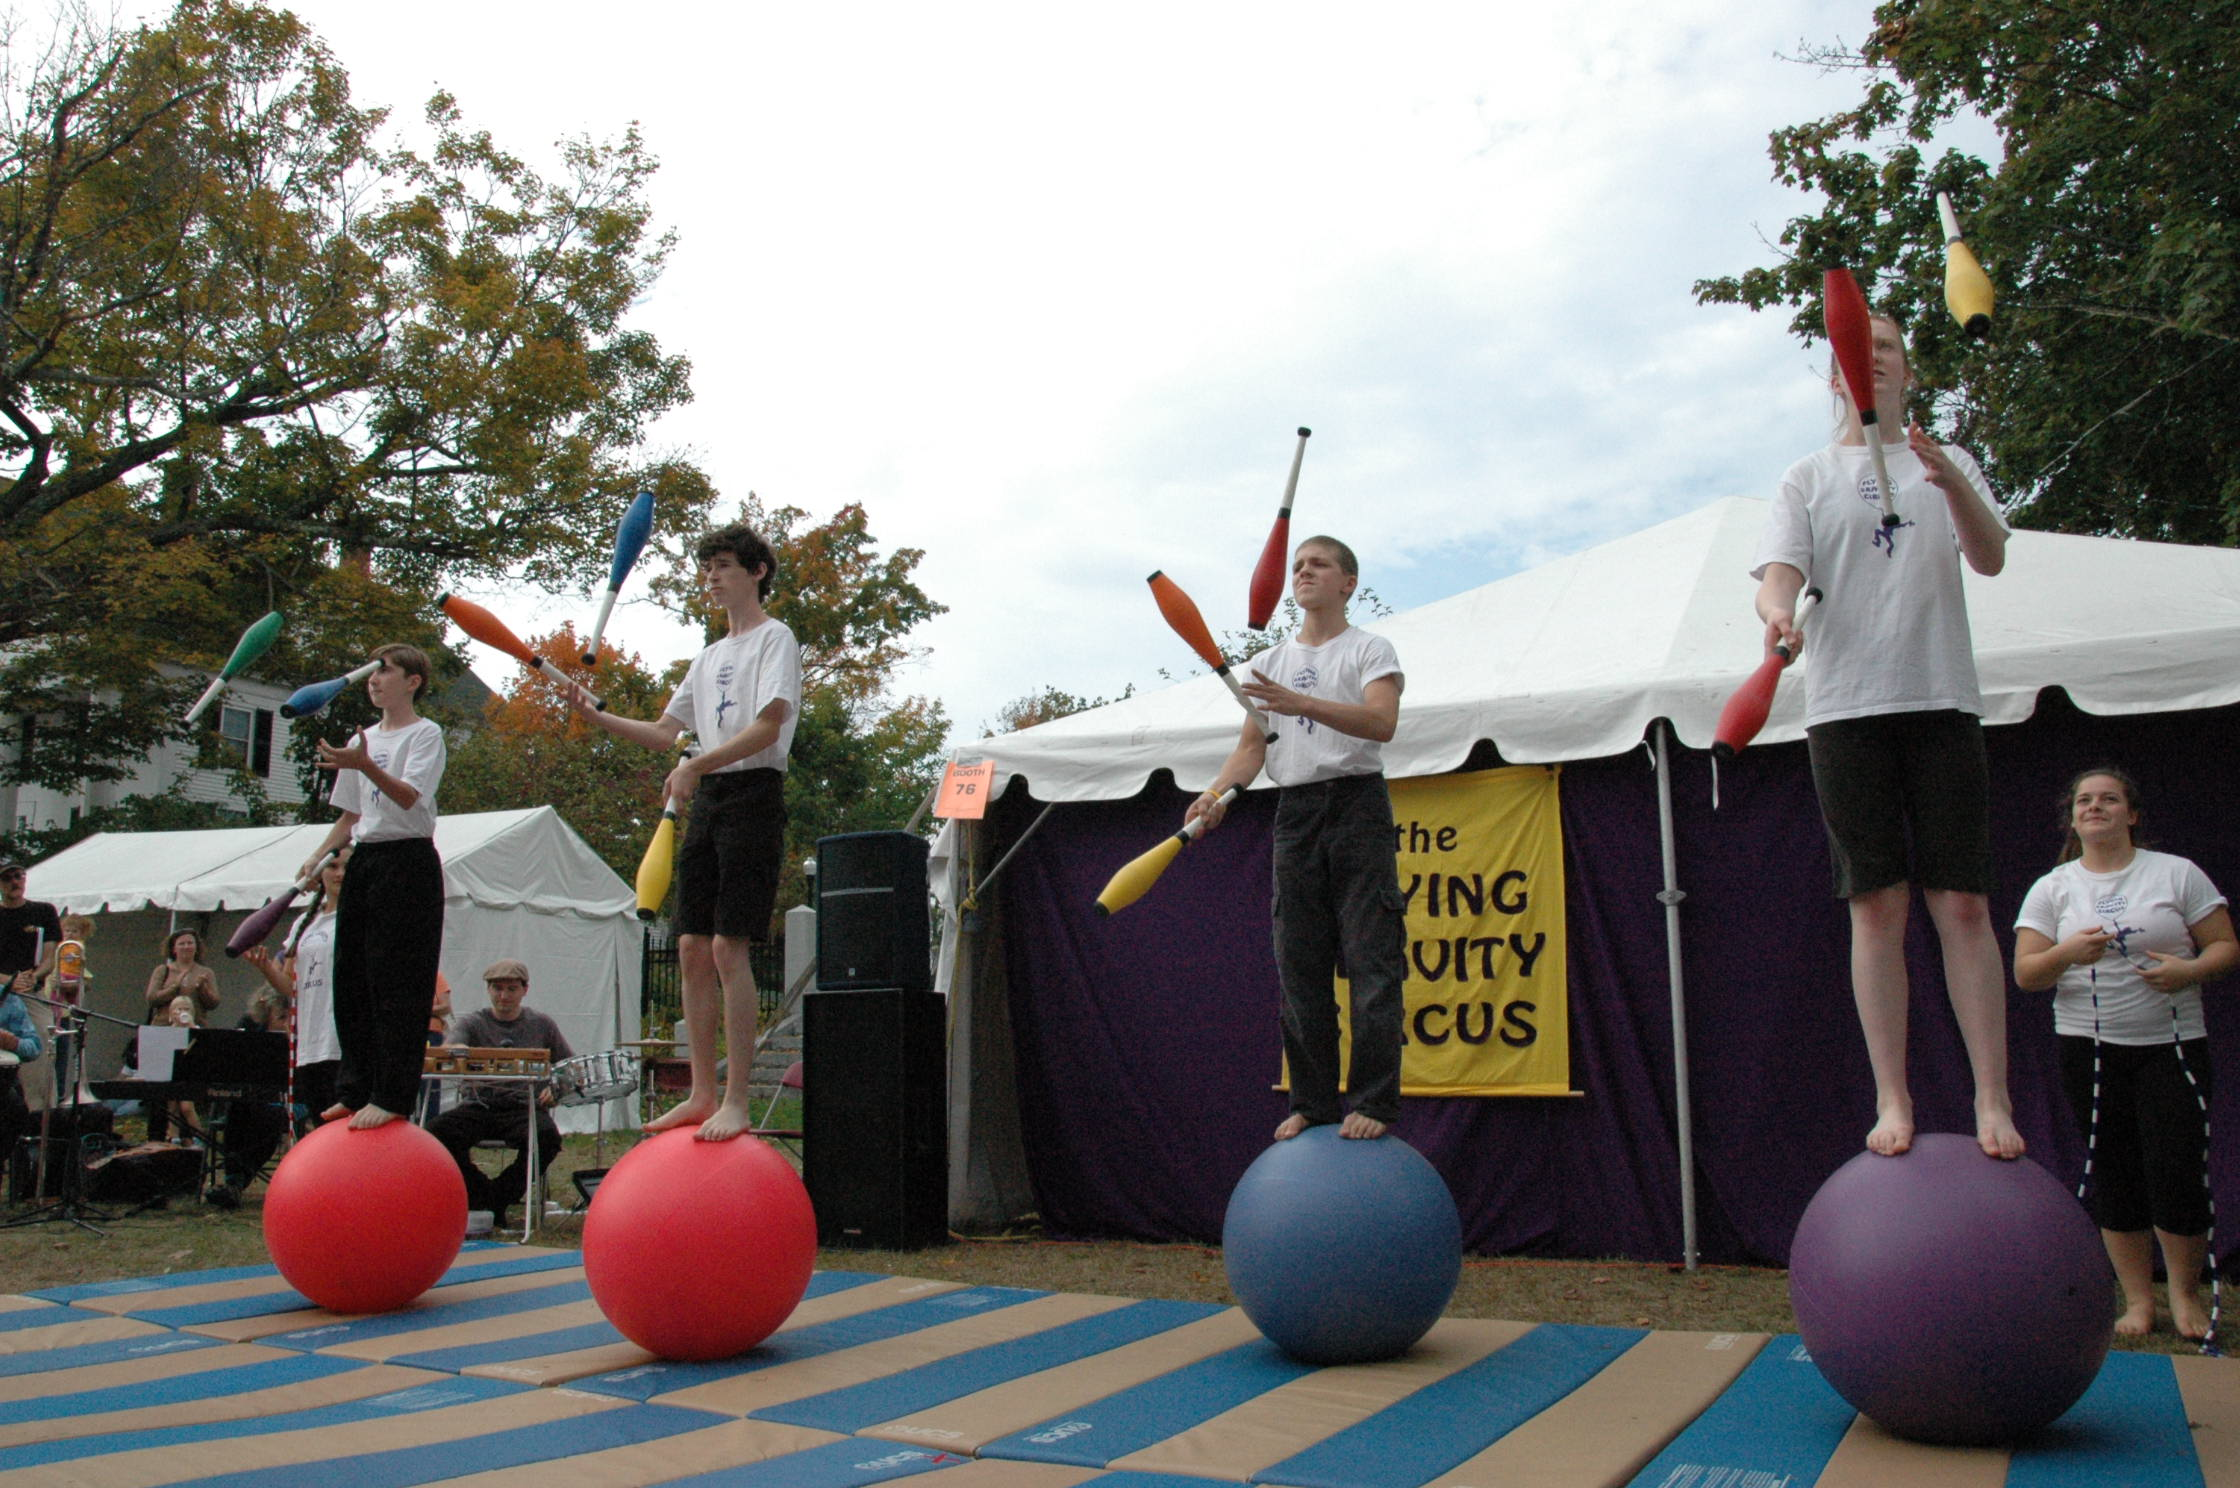 2012-10-06 Flyin Gravity Circus - Pumpkin 071.JPG